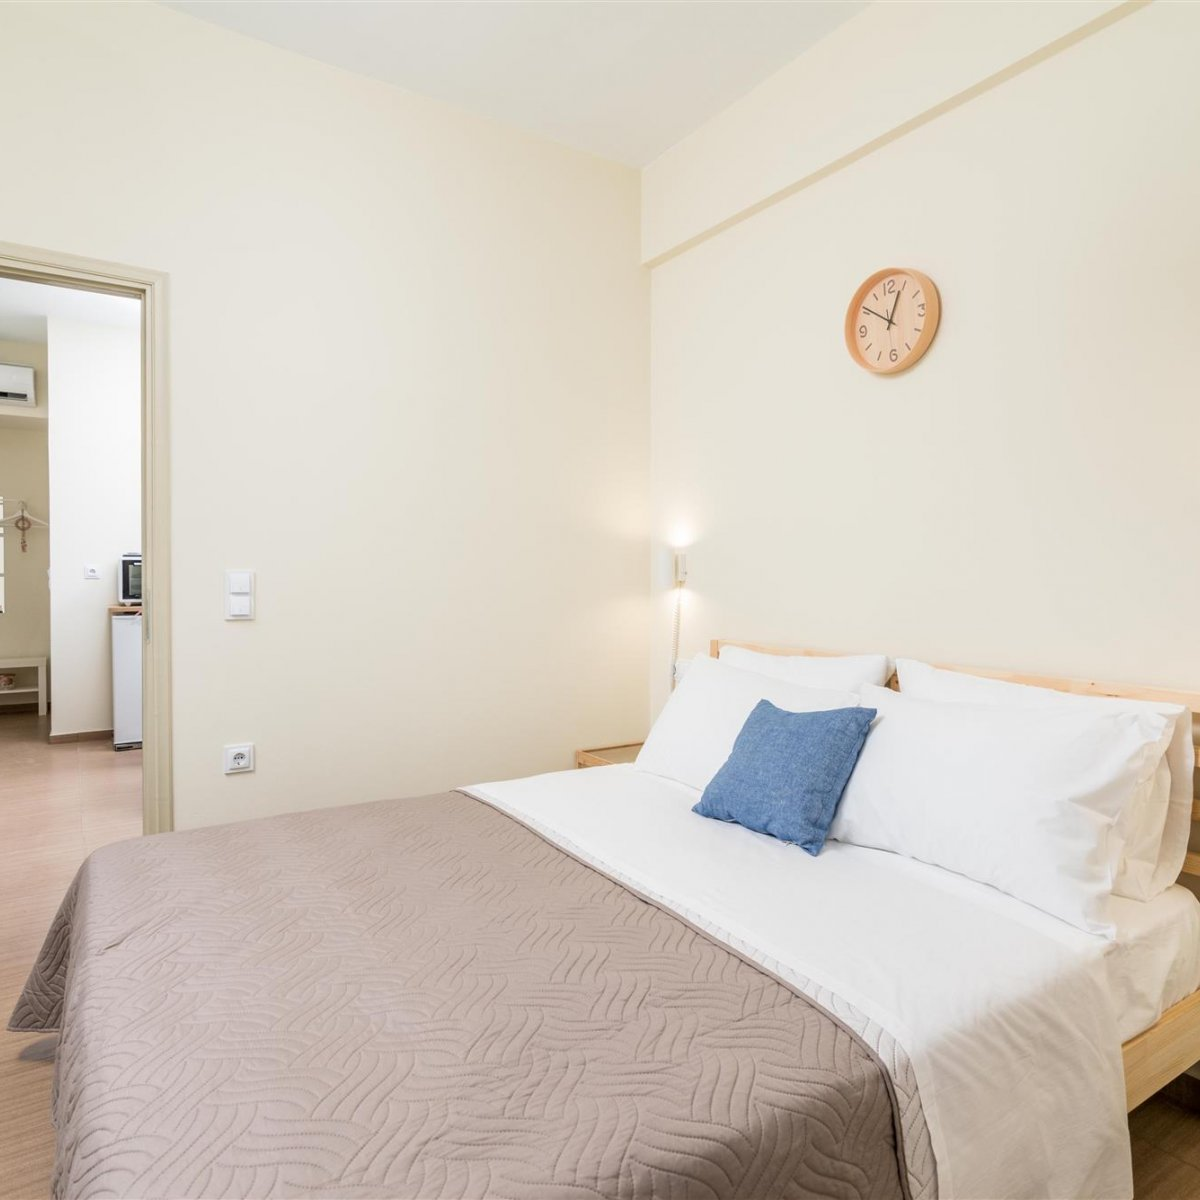 Mokamvilia Luxury Apartments - Διαμέρισμα Μέντα